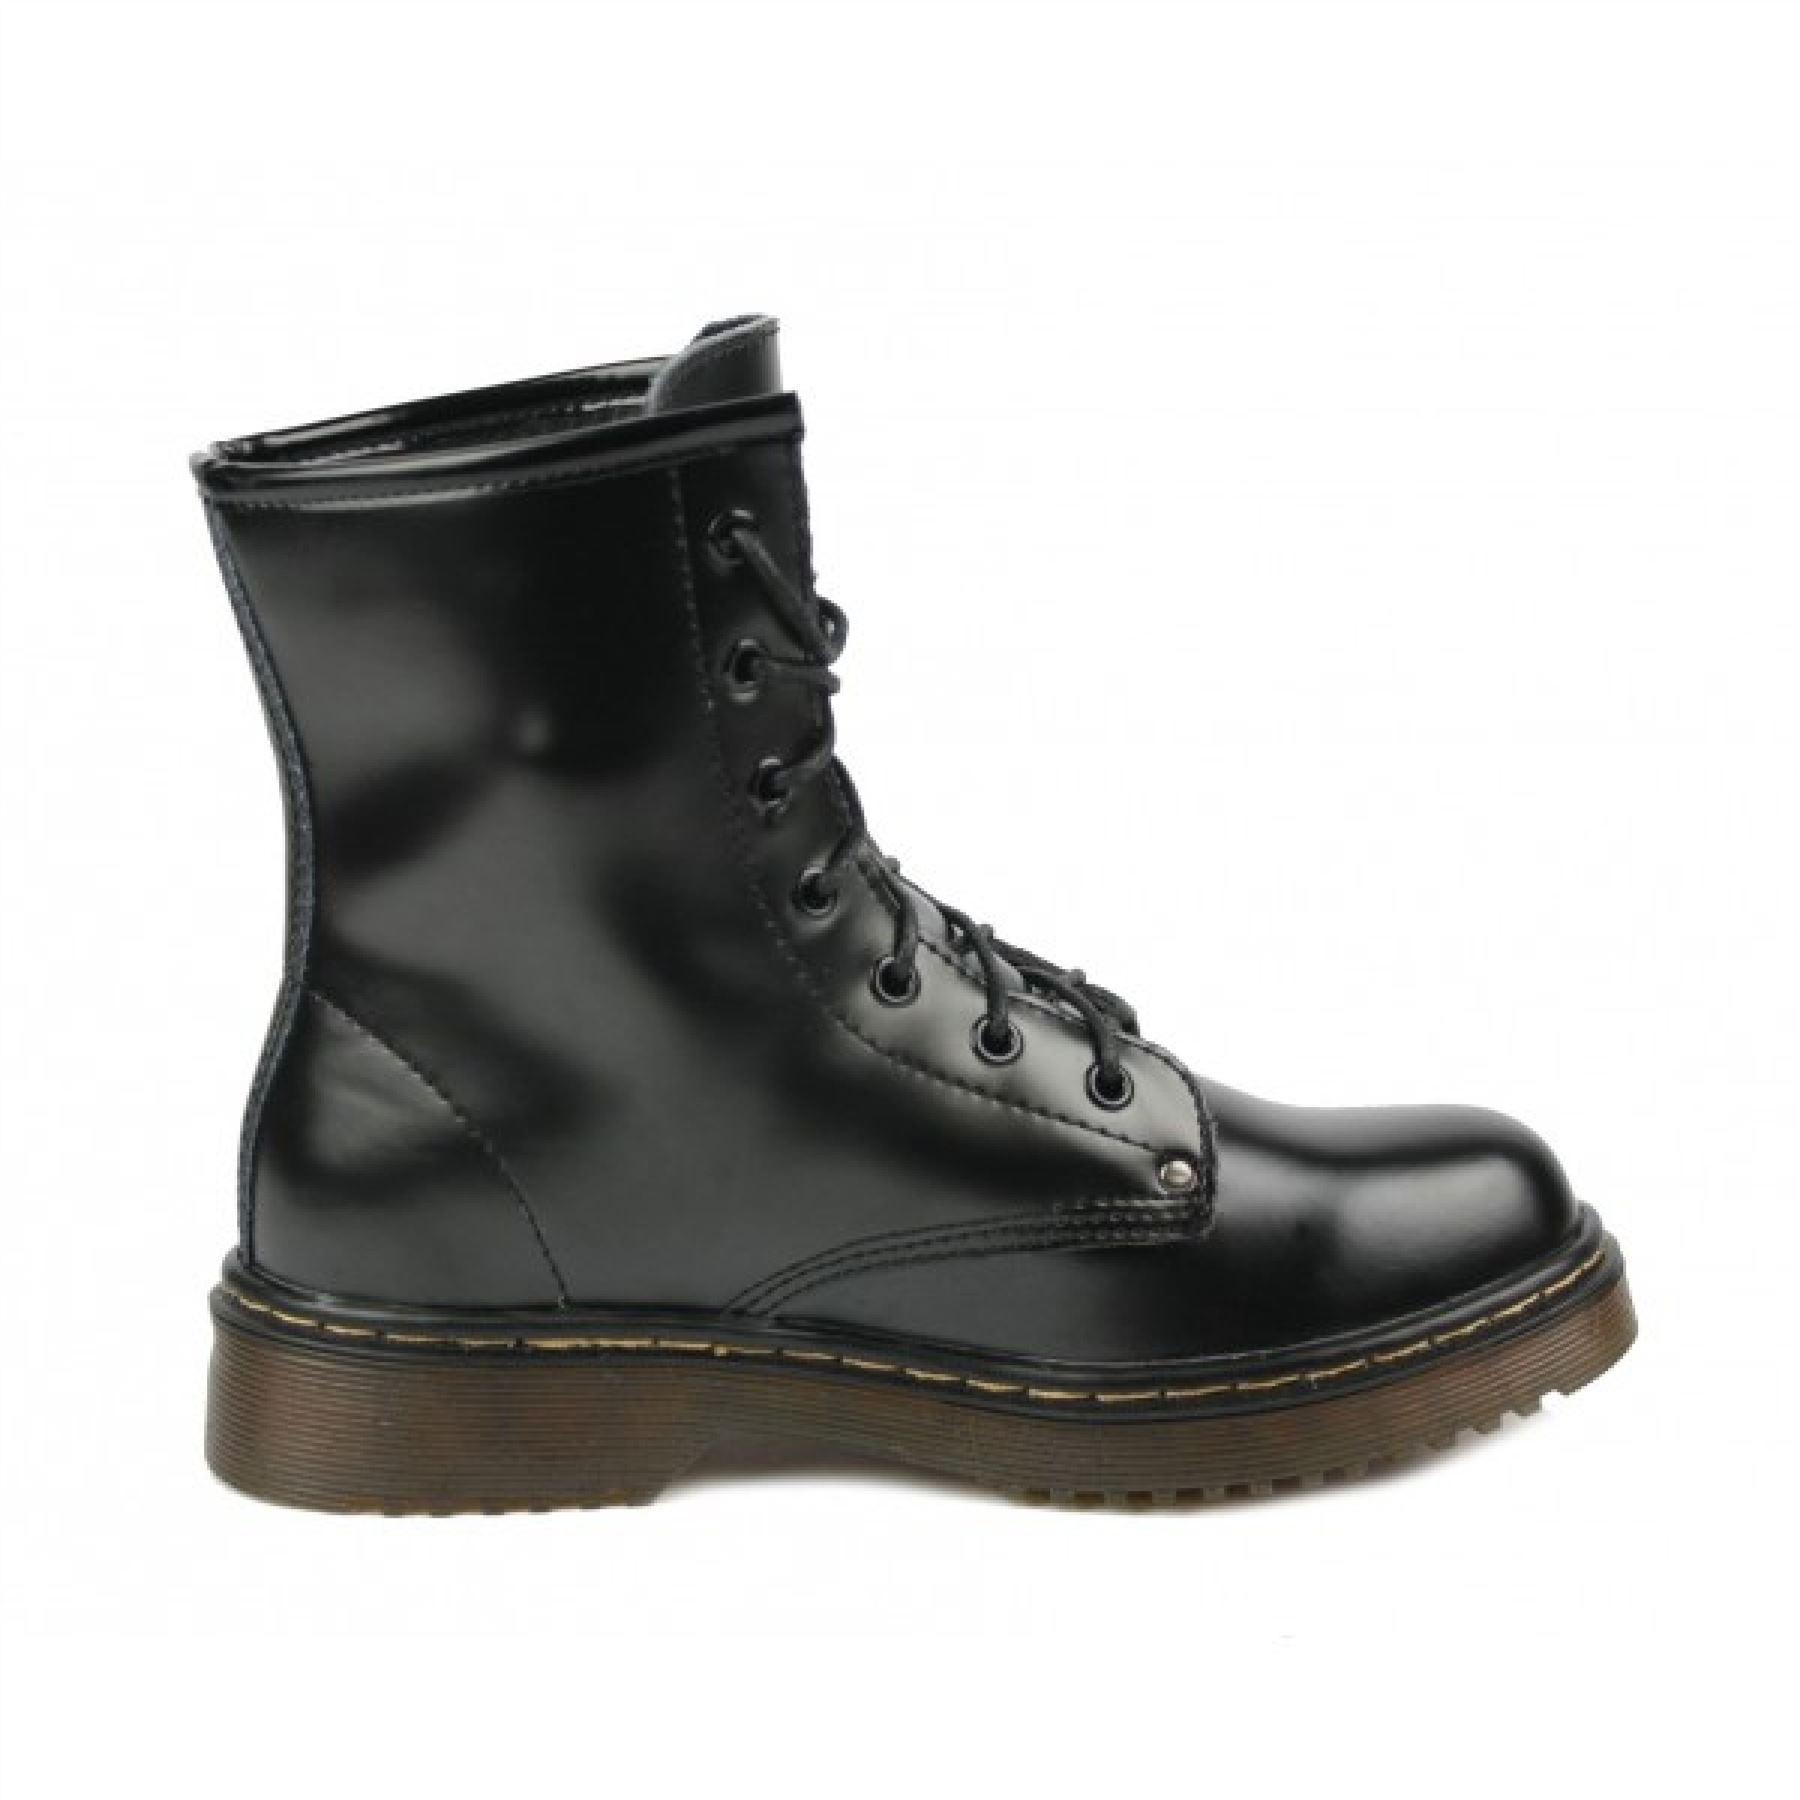 retro combat leather boots womens lace up vintage